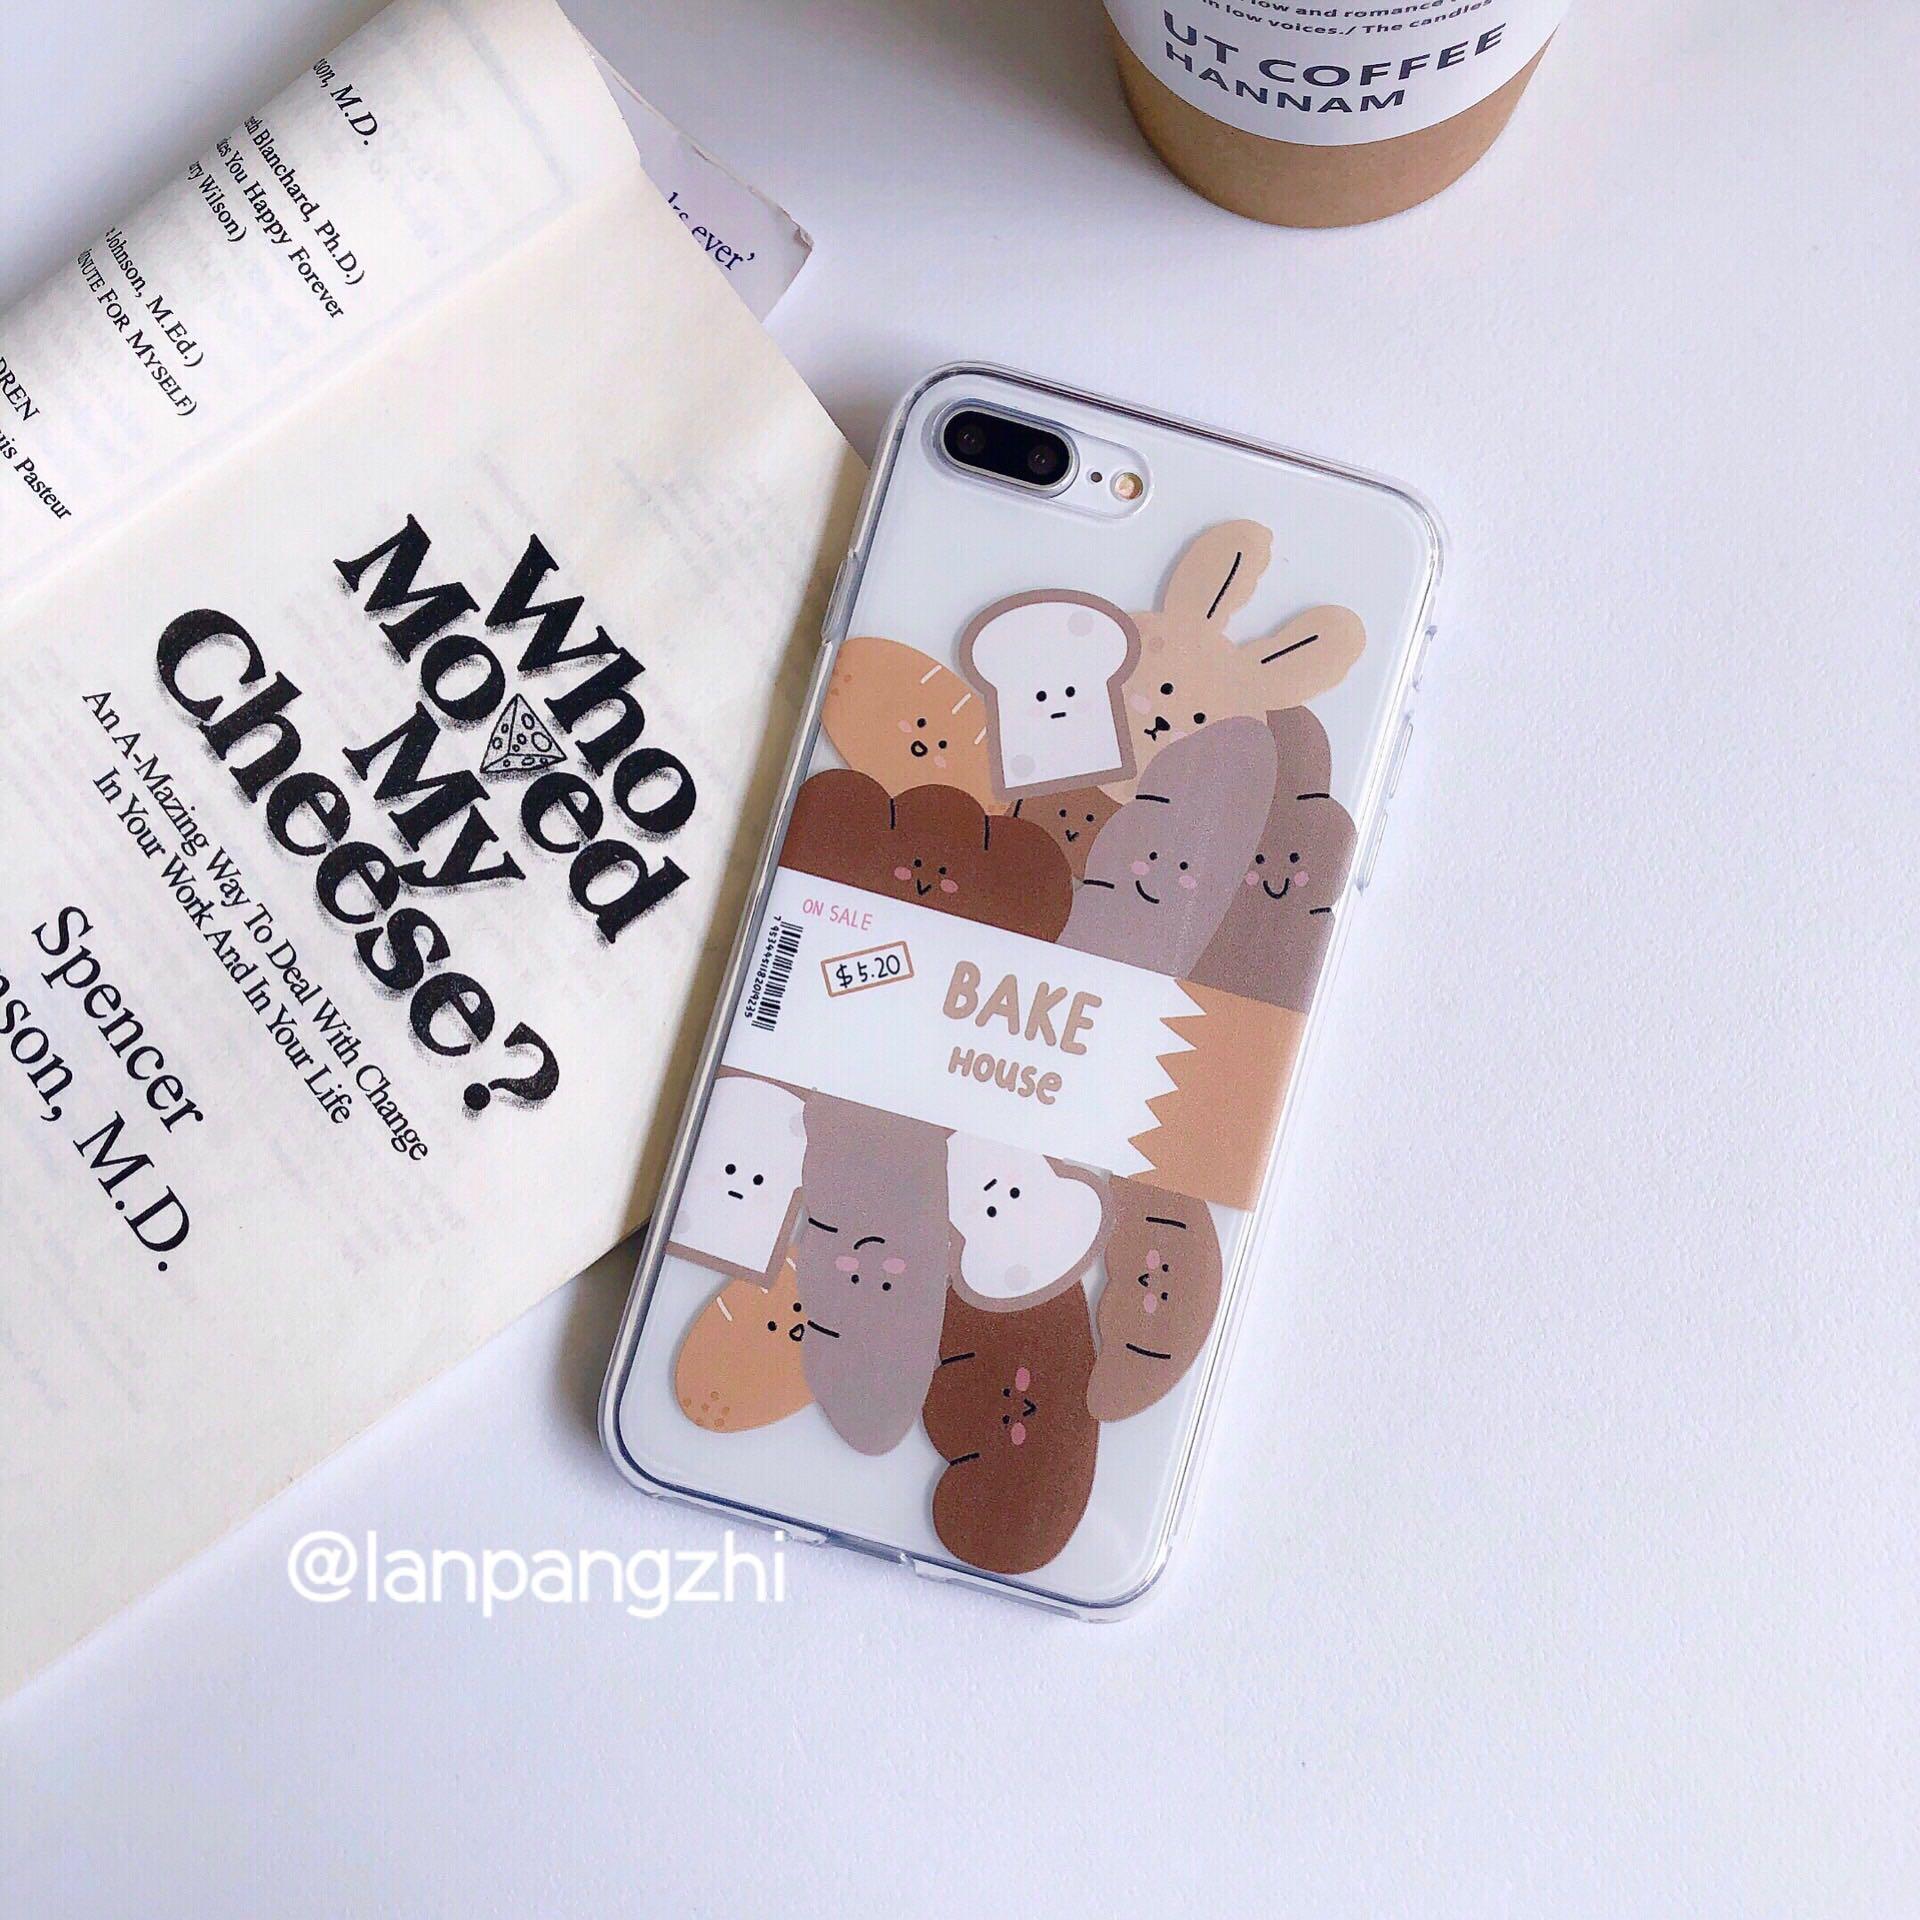 ins面包表情苹果11手机壳iPhonexsmax软xr/8plus/7/6s/(用39元券)